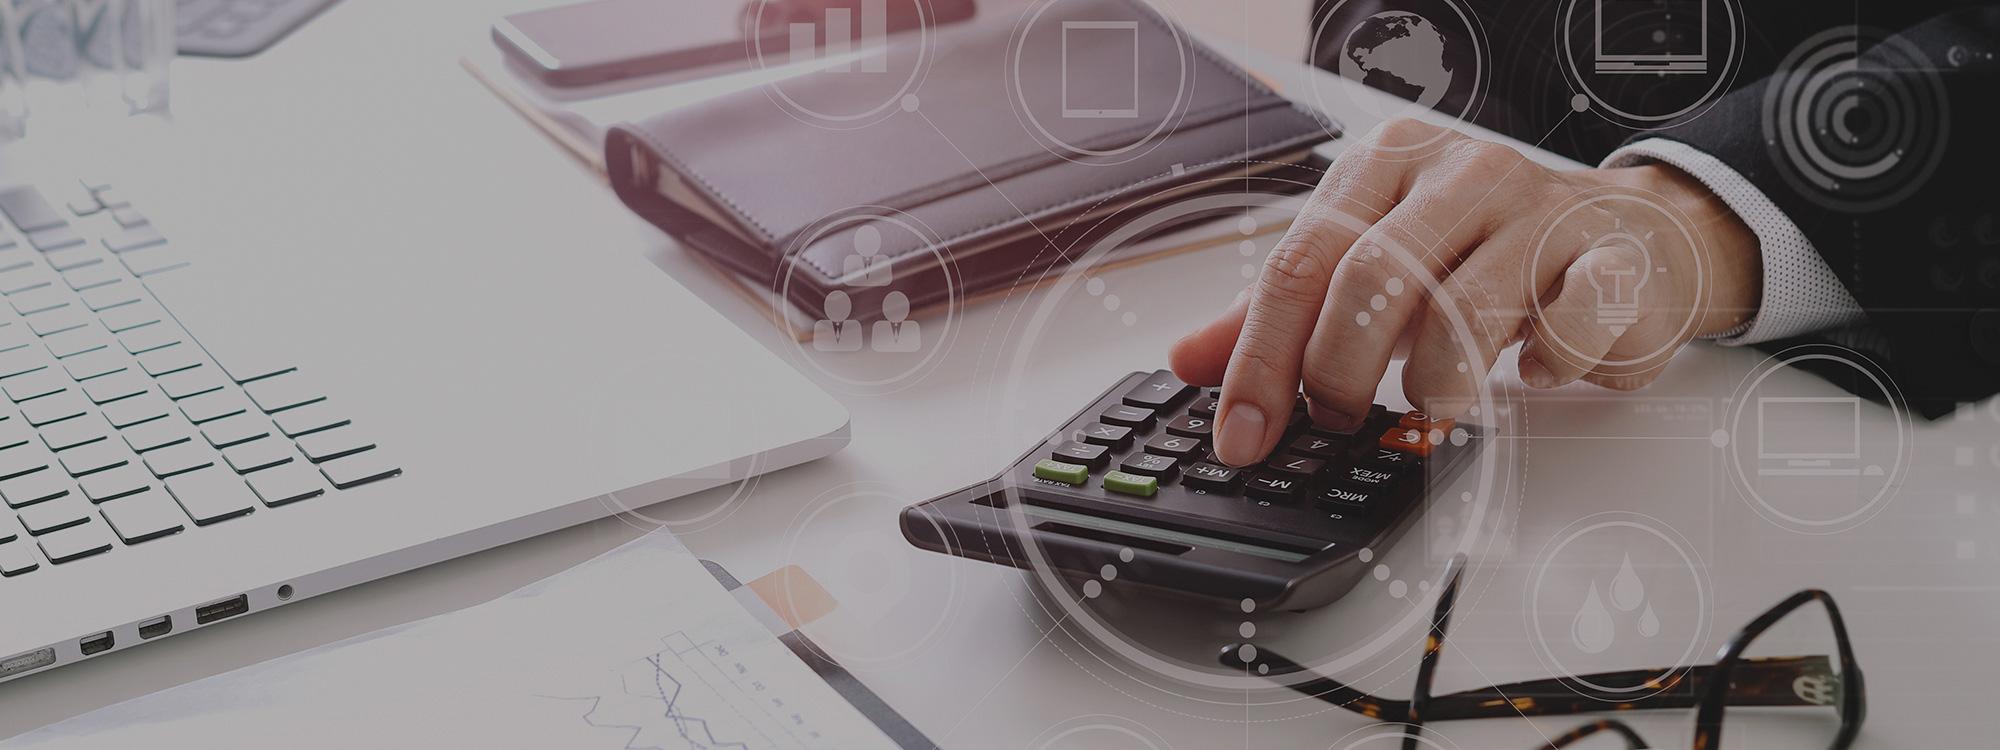 City Bank Personal Loan Emi Calculator